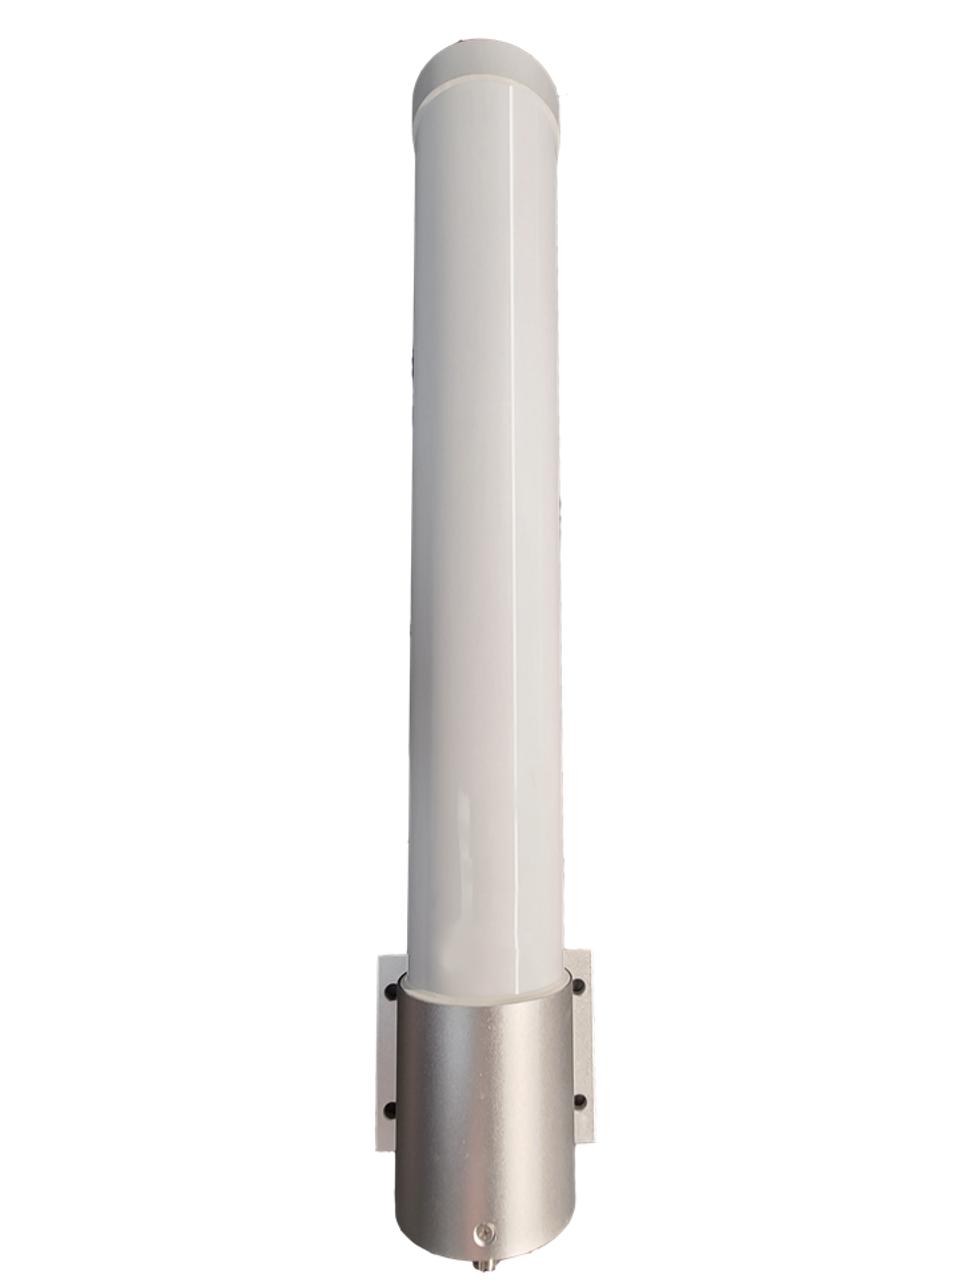 M25T T-Mobile Omni Directional Fiberglass Cellular 4G LTE 5G NR Band 71 External Data M2M IoT Antenna